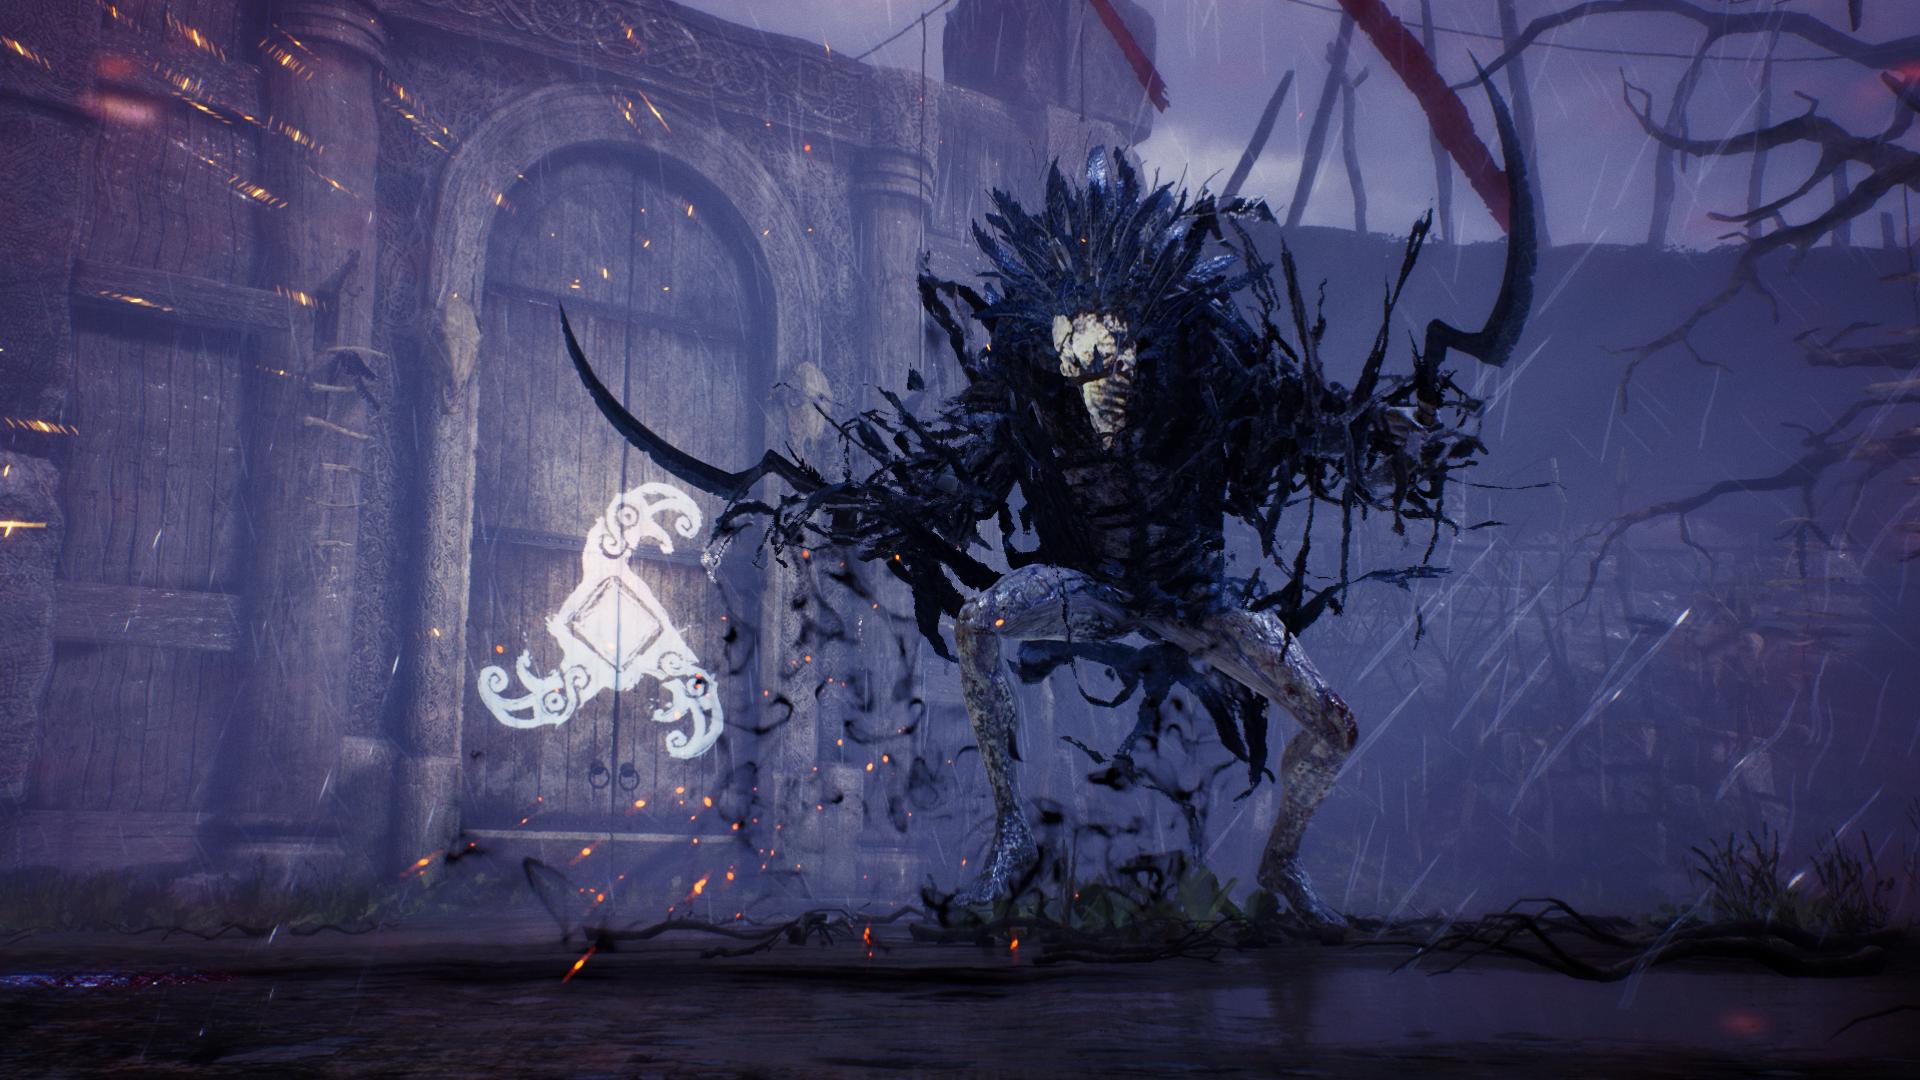 Hasil gambar untuk hellblade senua's sacrifice hela and valravn